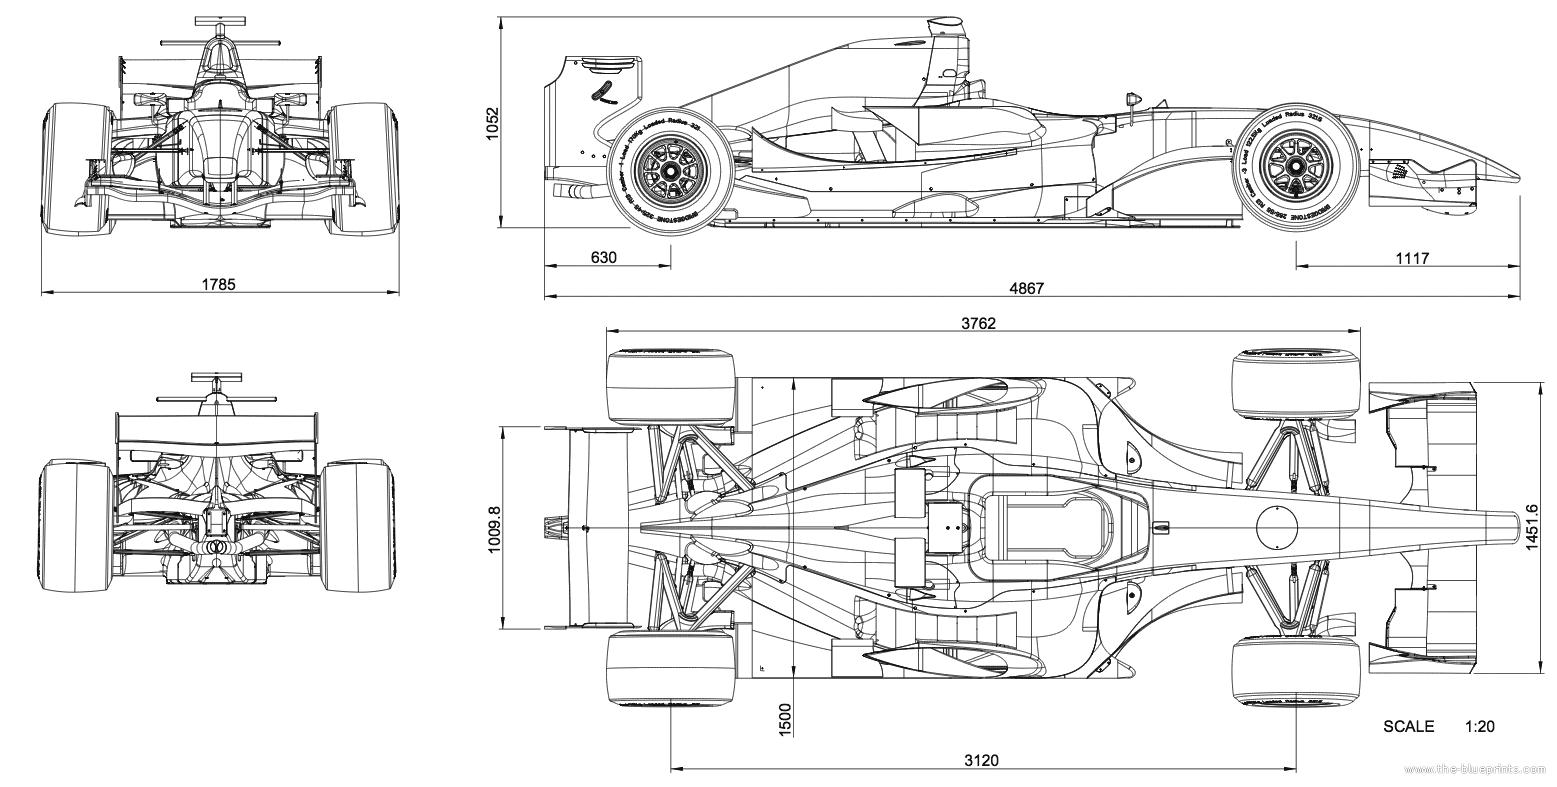 dallara gp208 dallas trafic cars and motorcycles concept racing floor plans [ 1557 x 787 Pixel ]